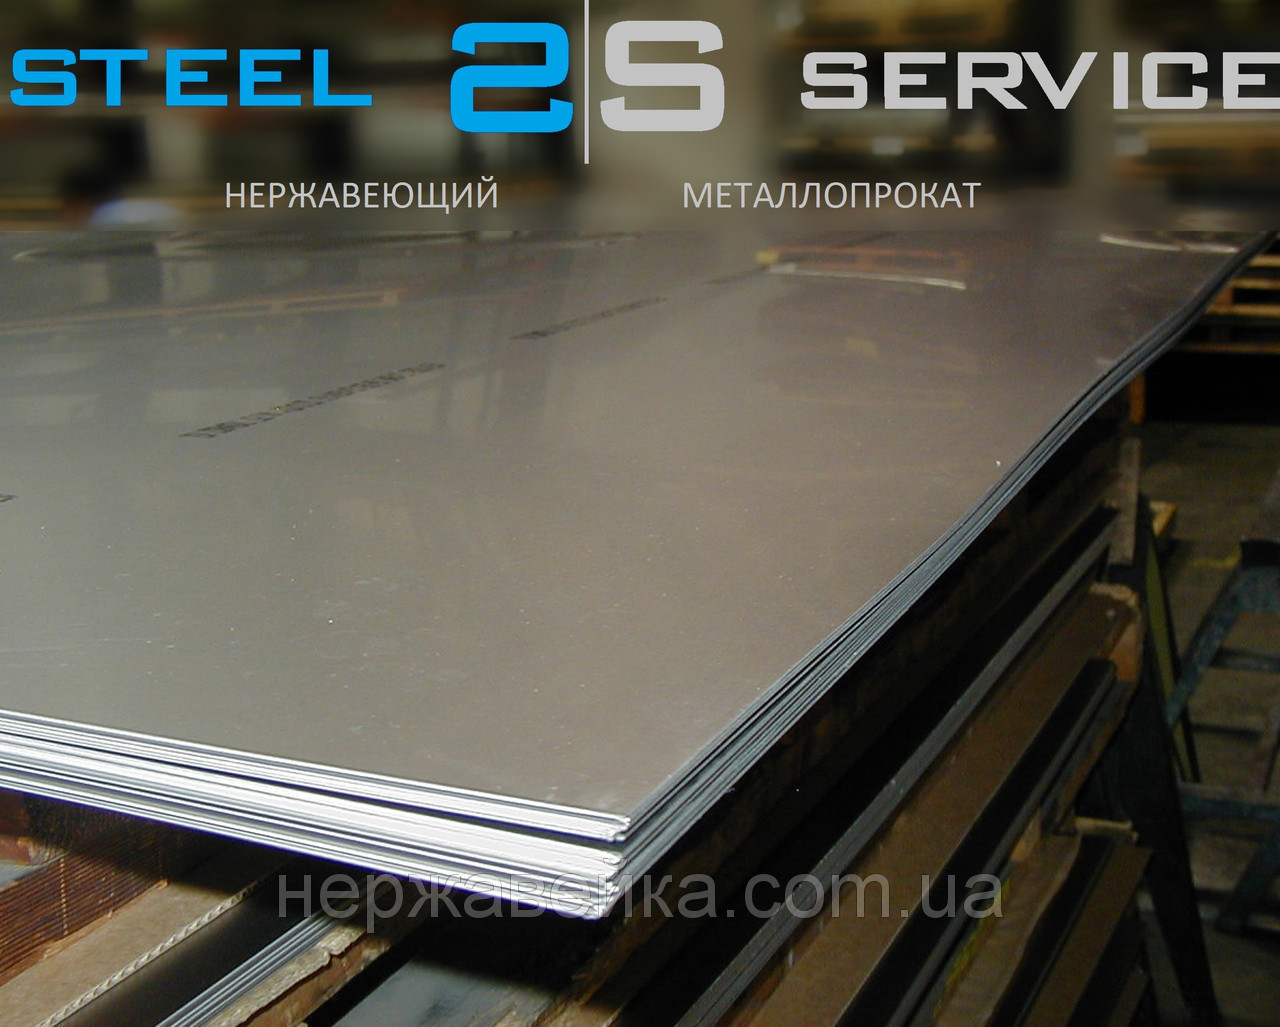 Нержавейка лист 0,5х1250х2500мм AISI 430(12Х17) 2B - матовый, технический